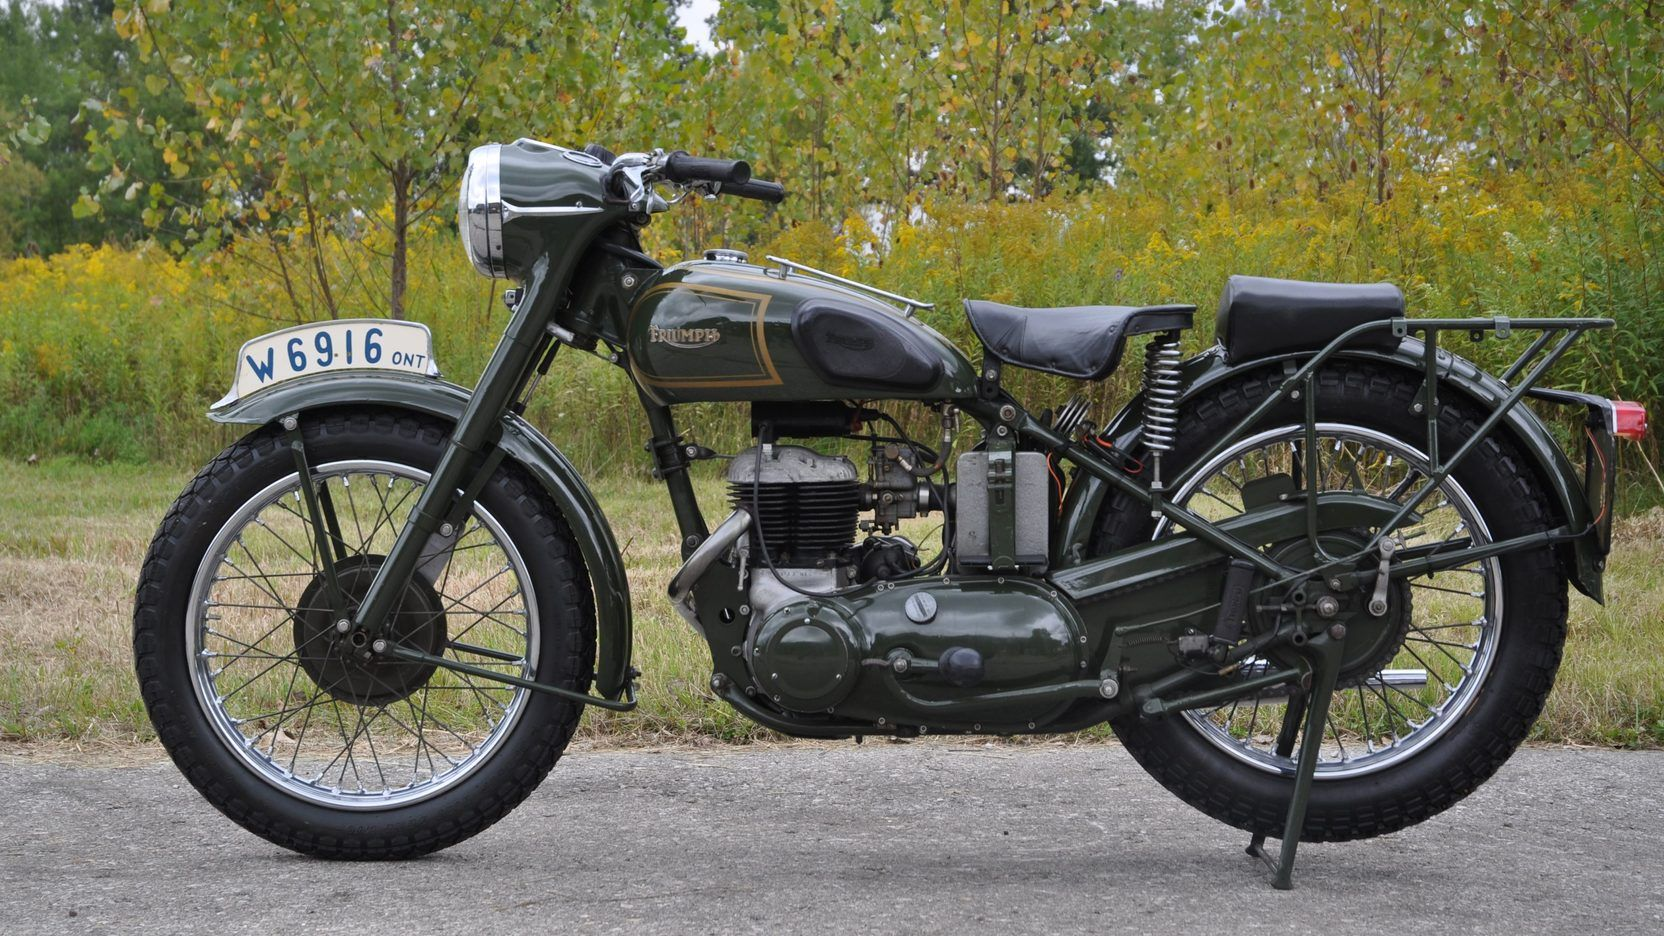 1942 Triumph Trw 500 S17 Las Vegas 2015 Trw Mecum Auction Classic Motorcycles